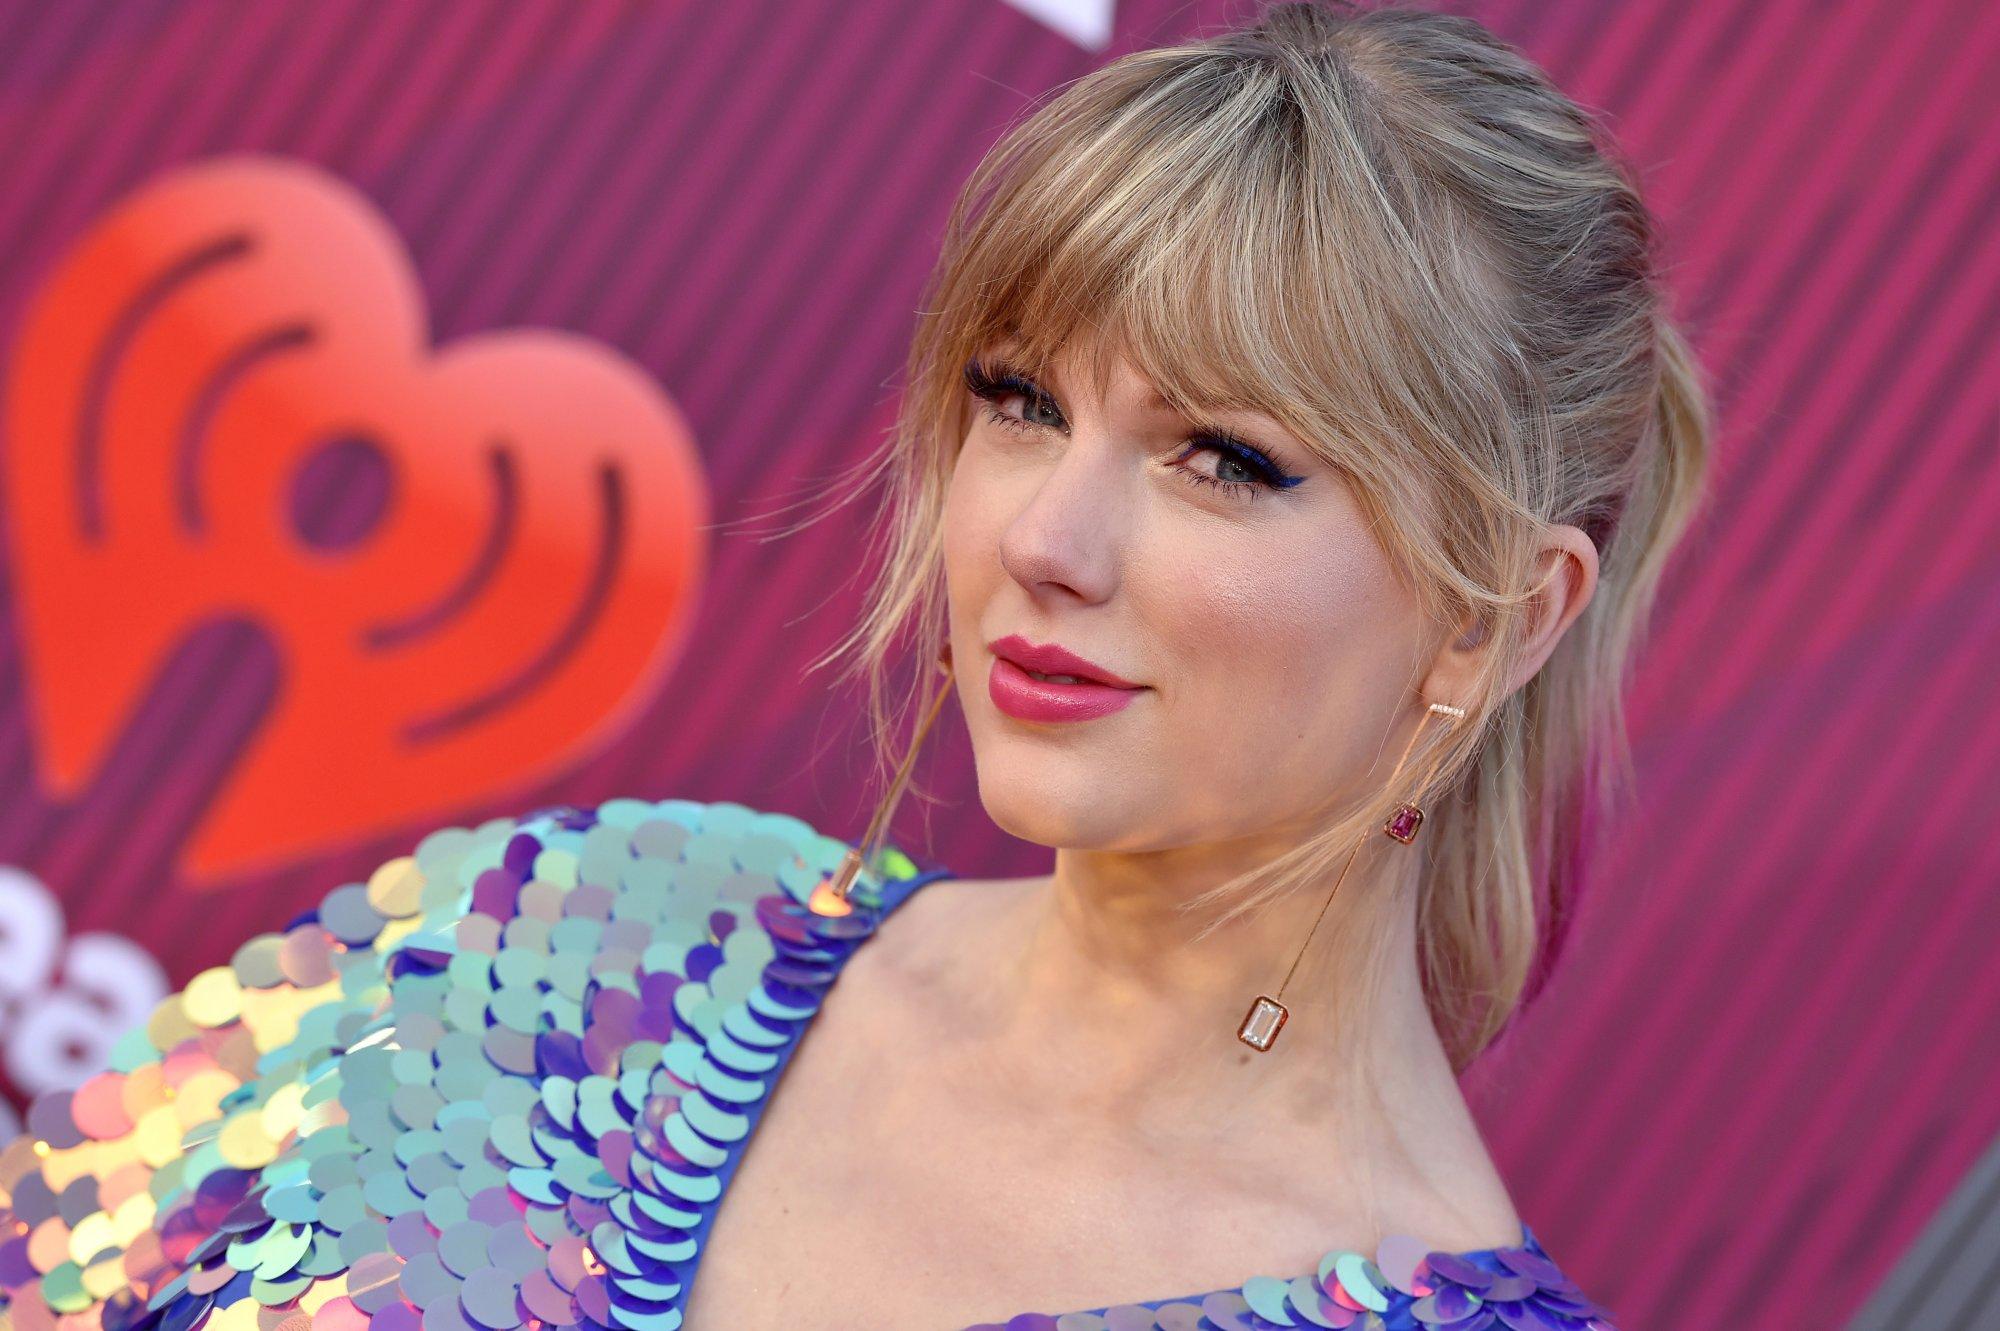 Taylor Swift baalt van erkenning slechts twee genders in VS thumbnail